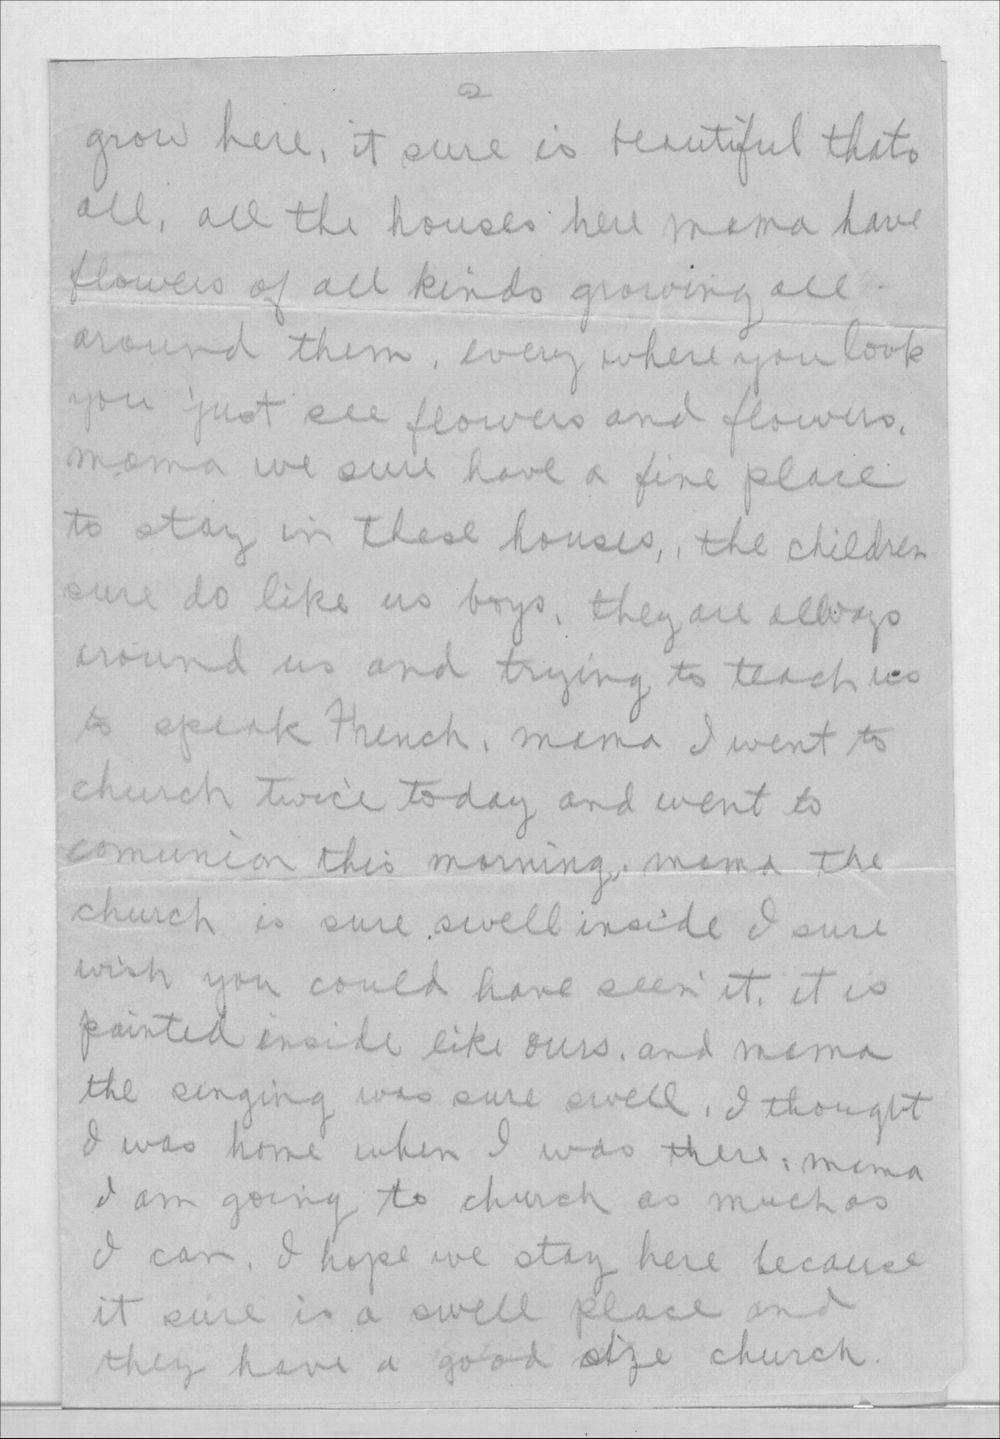 John A. Gersic to Mrs. Joseph Gersic - 2